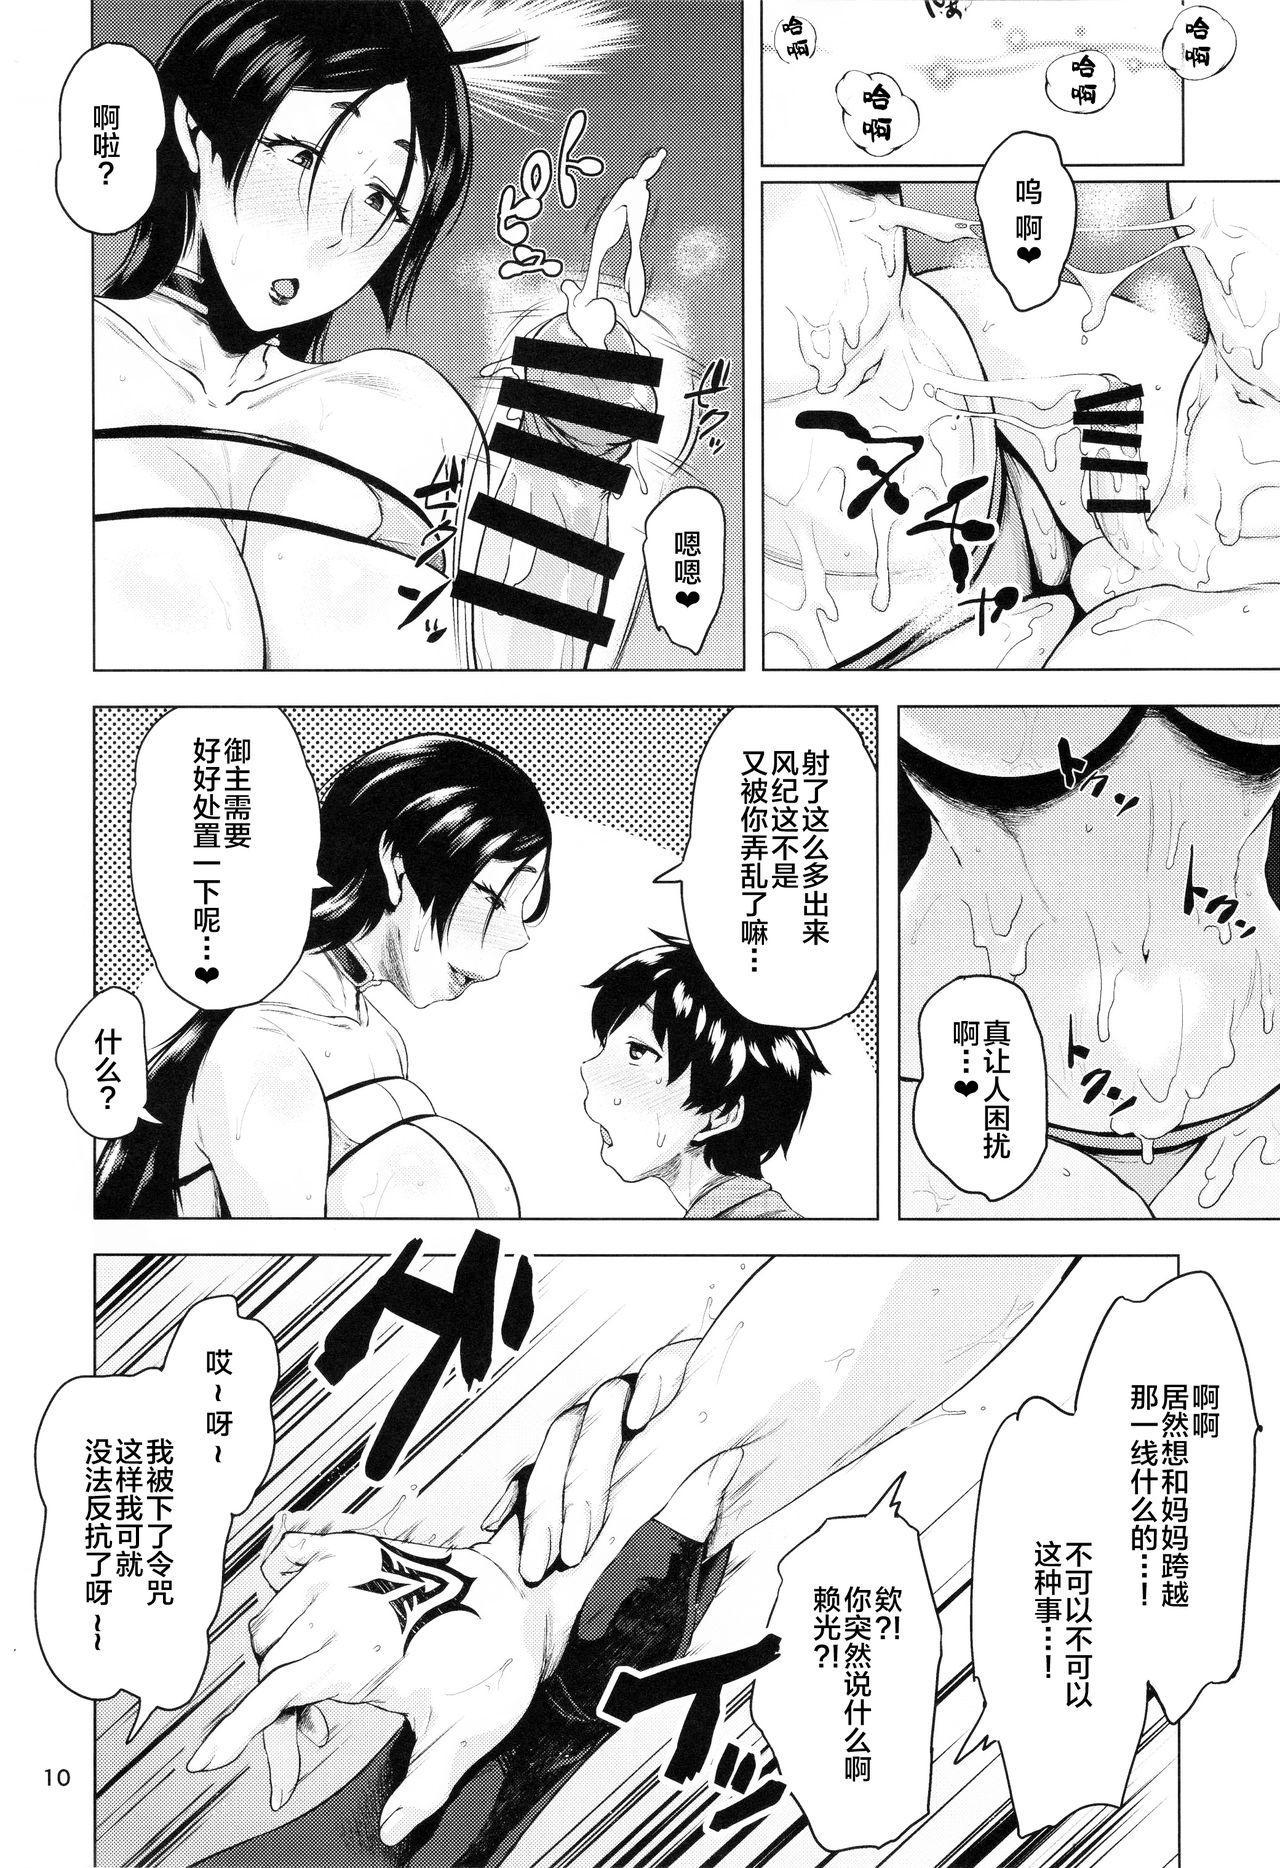 Natsu no Haha ni Goyoujin 11